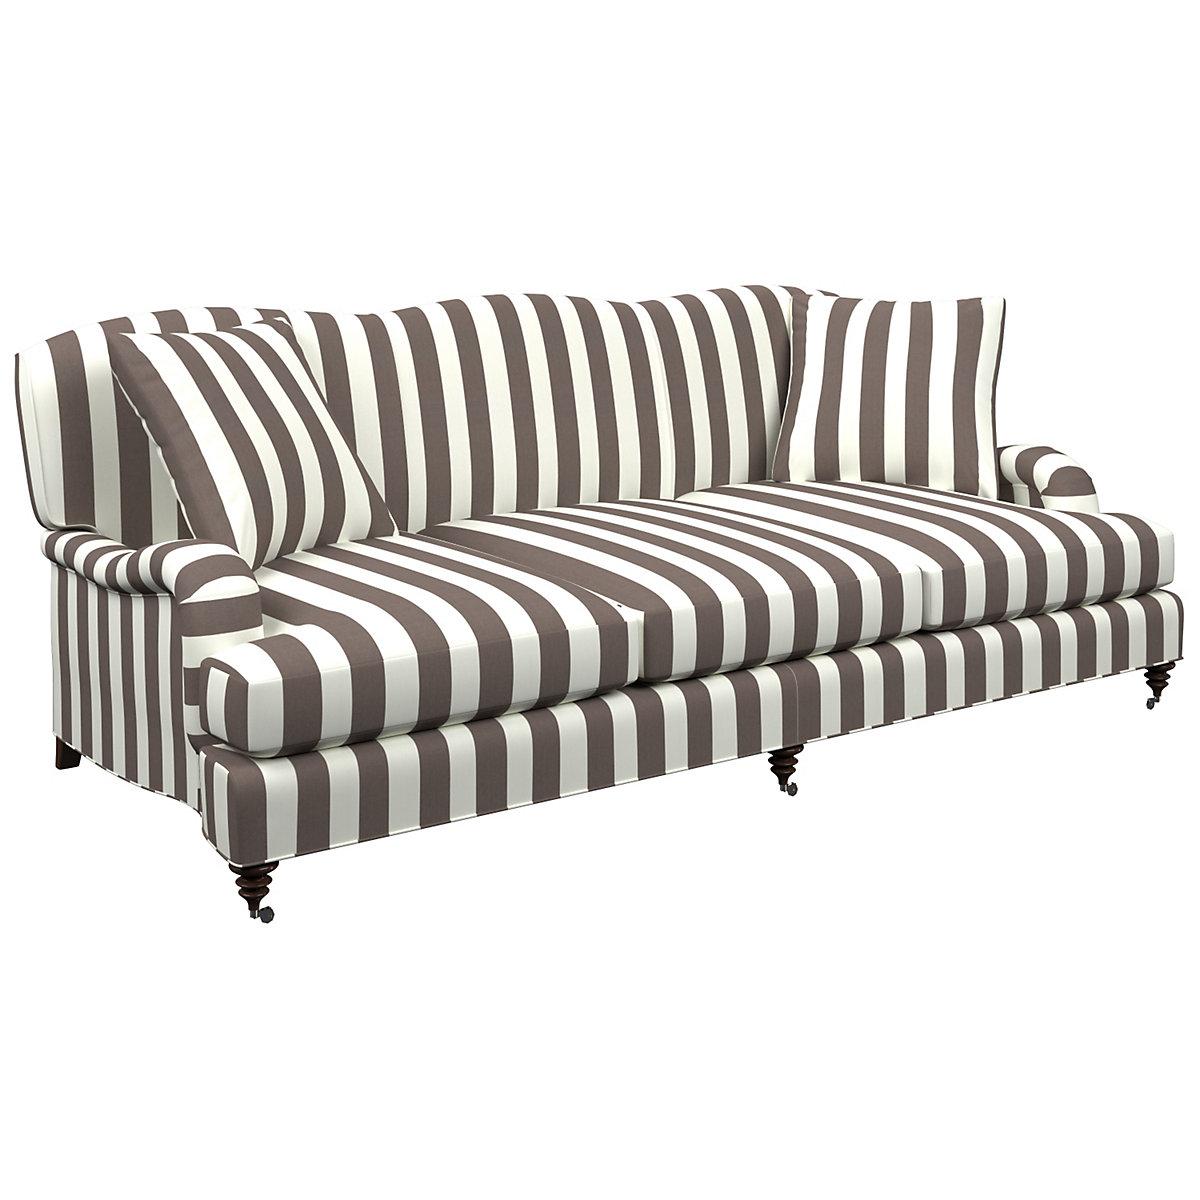 Alex shale litchfield 3 seater sofa furniture for Shale sofa bed